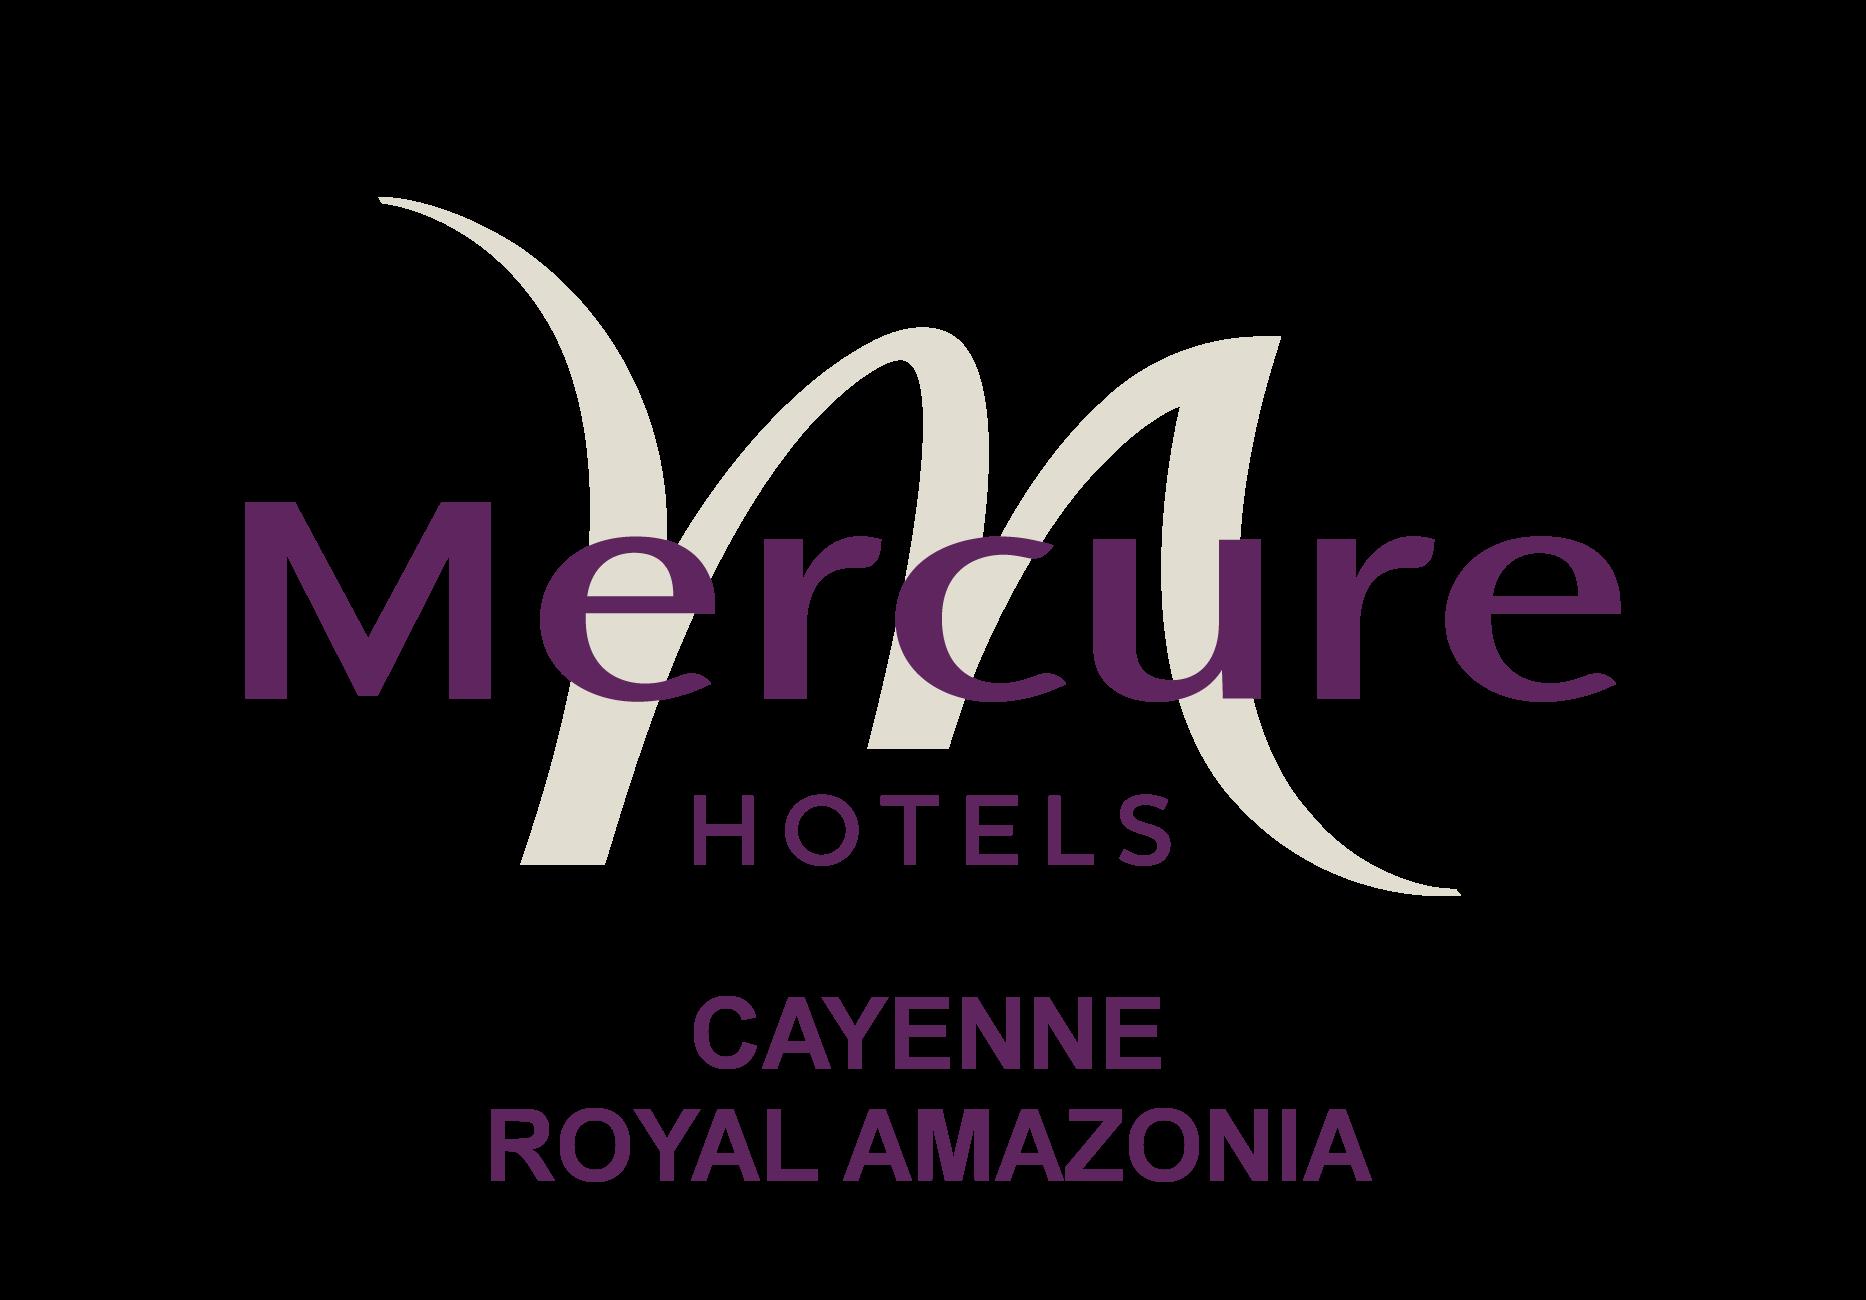 Logo Hotel Mercure Cayenne